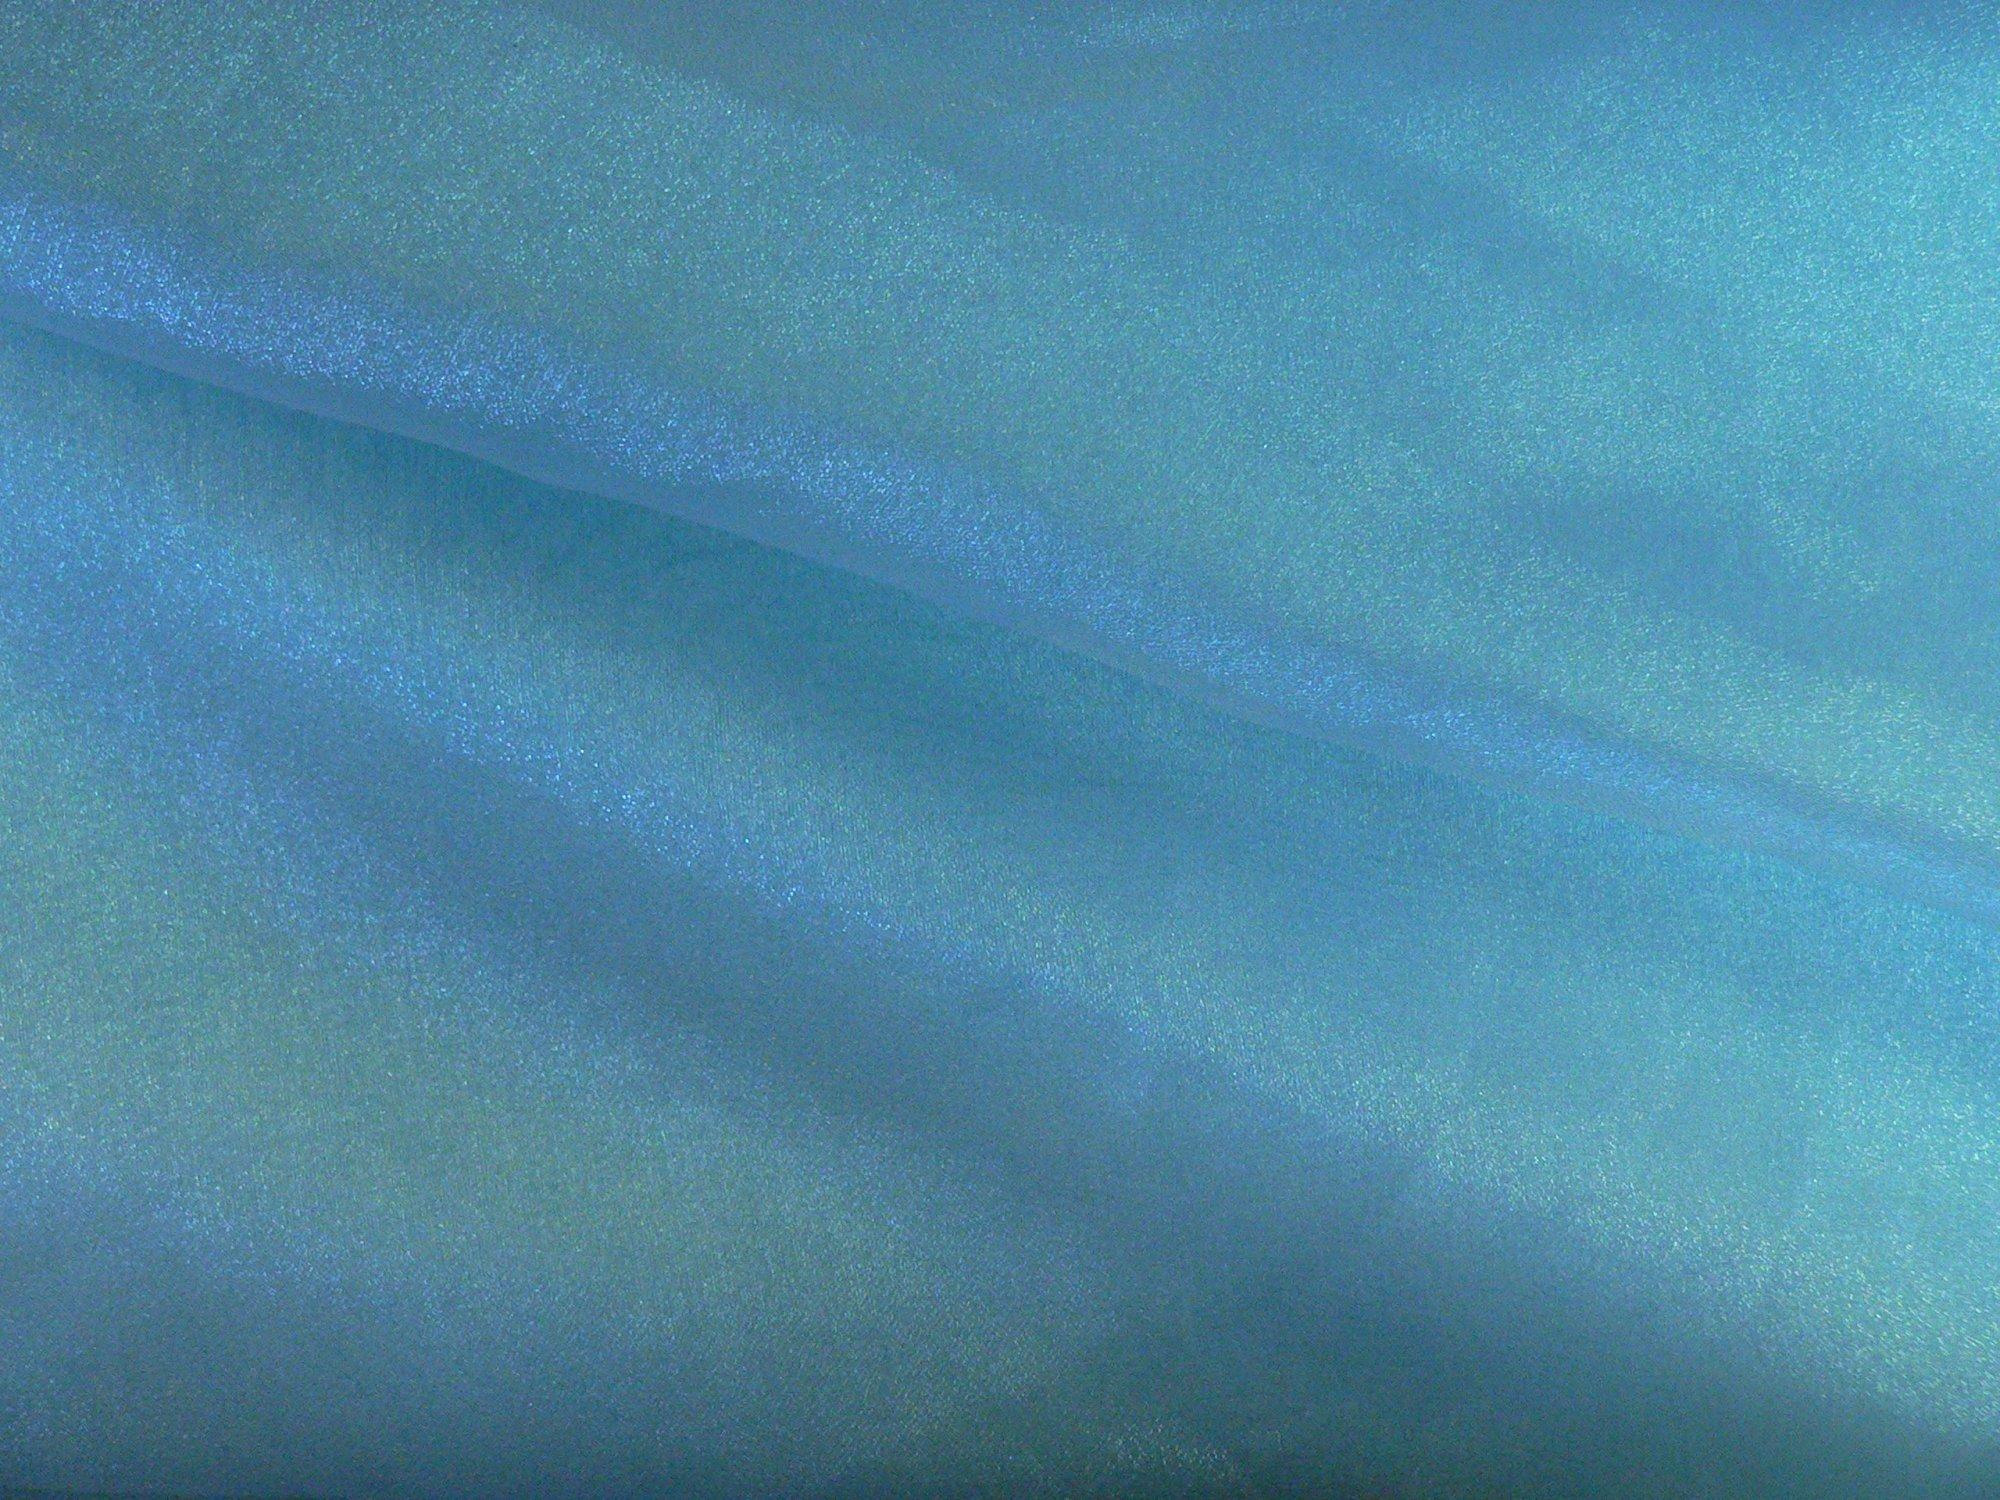 Organza, iridesent turquoise blue